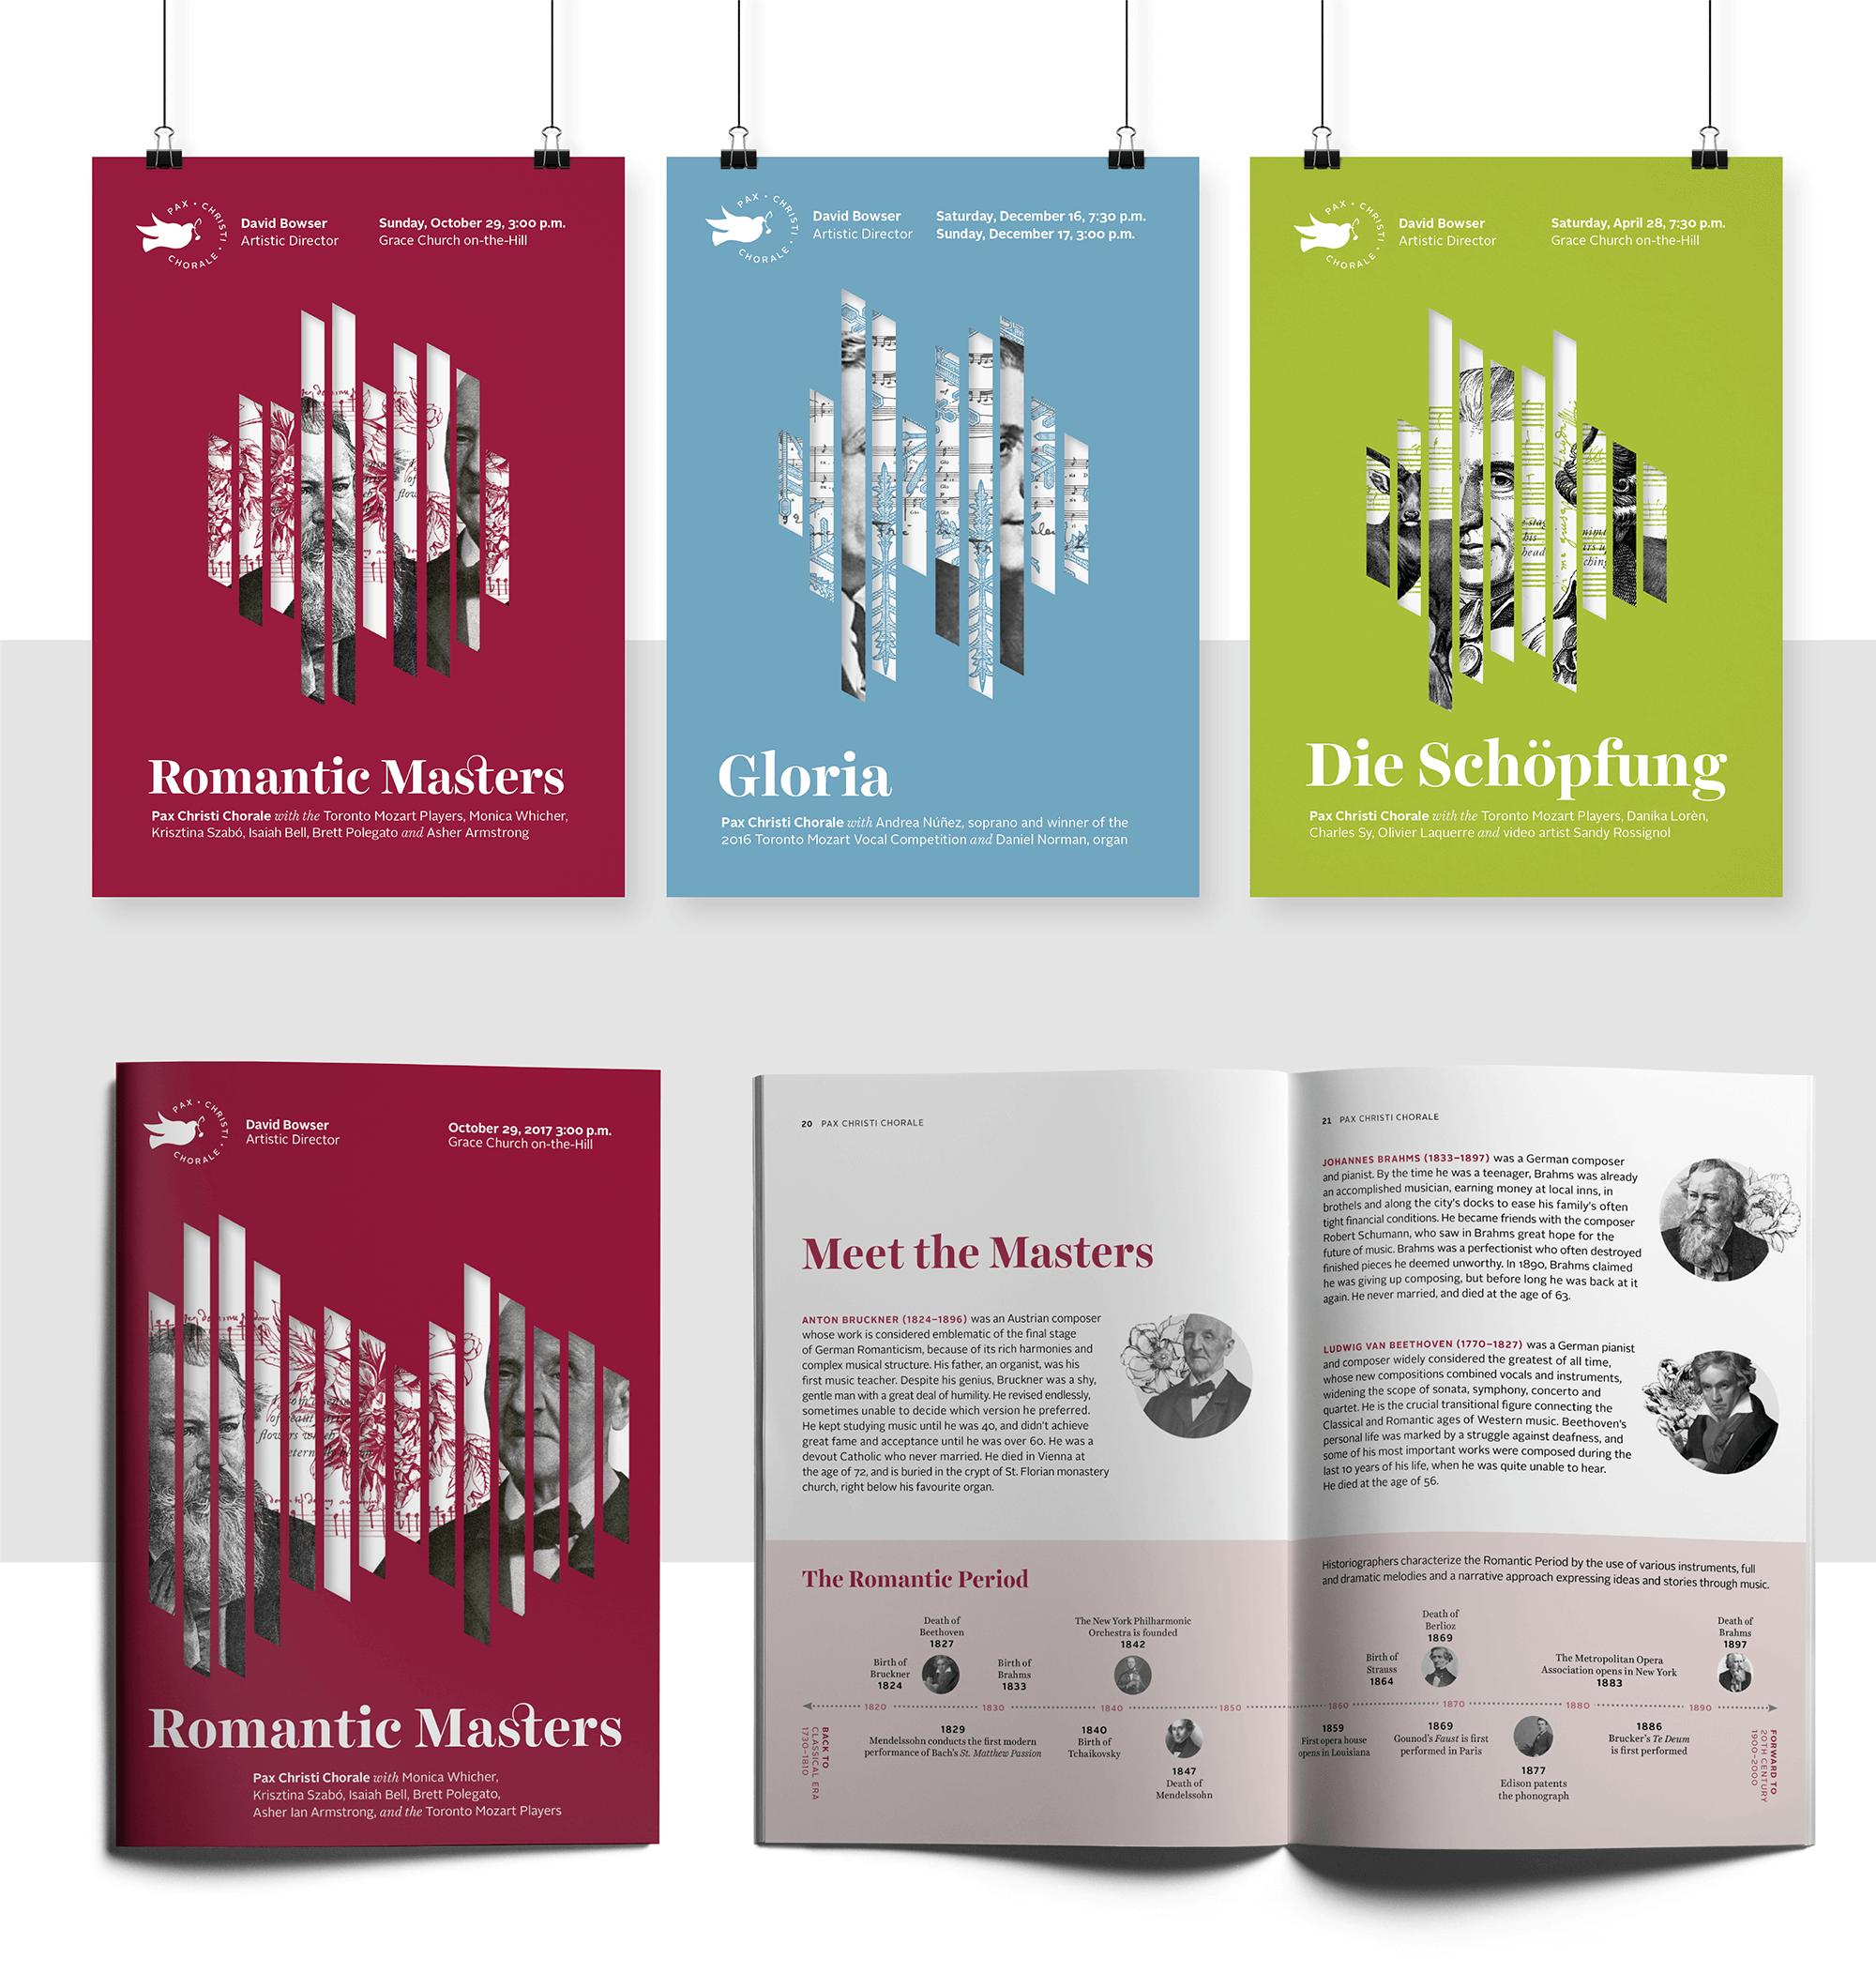 KatePeer_Designer_Strategist_London_England_Toronto_Branding_Editorial_Positioning_PCC-36.png